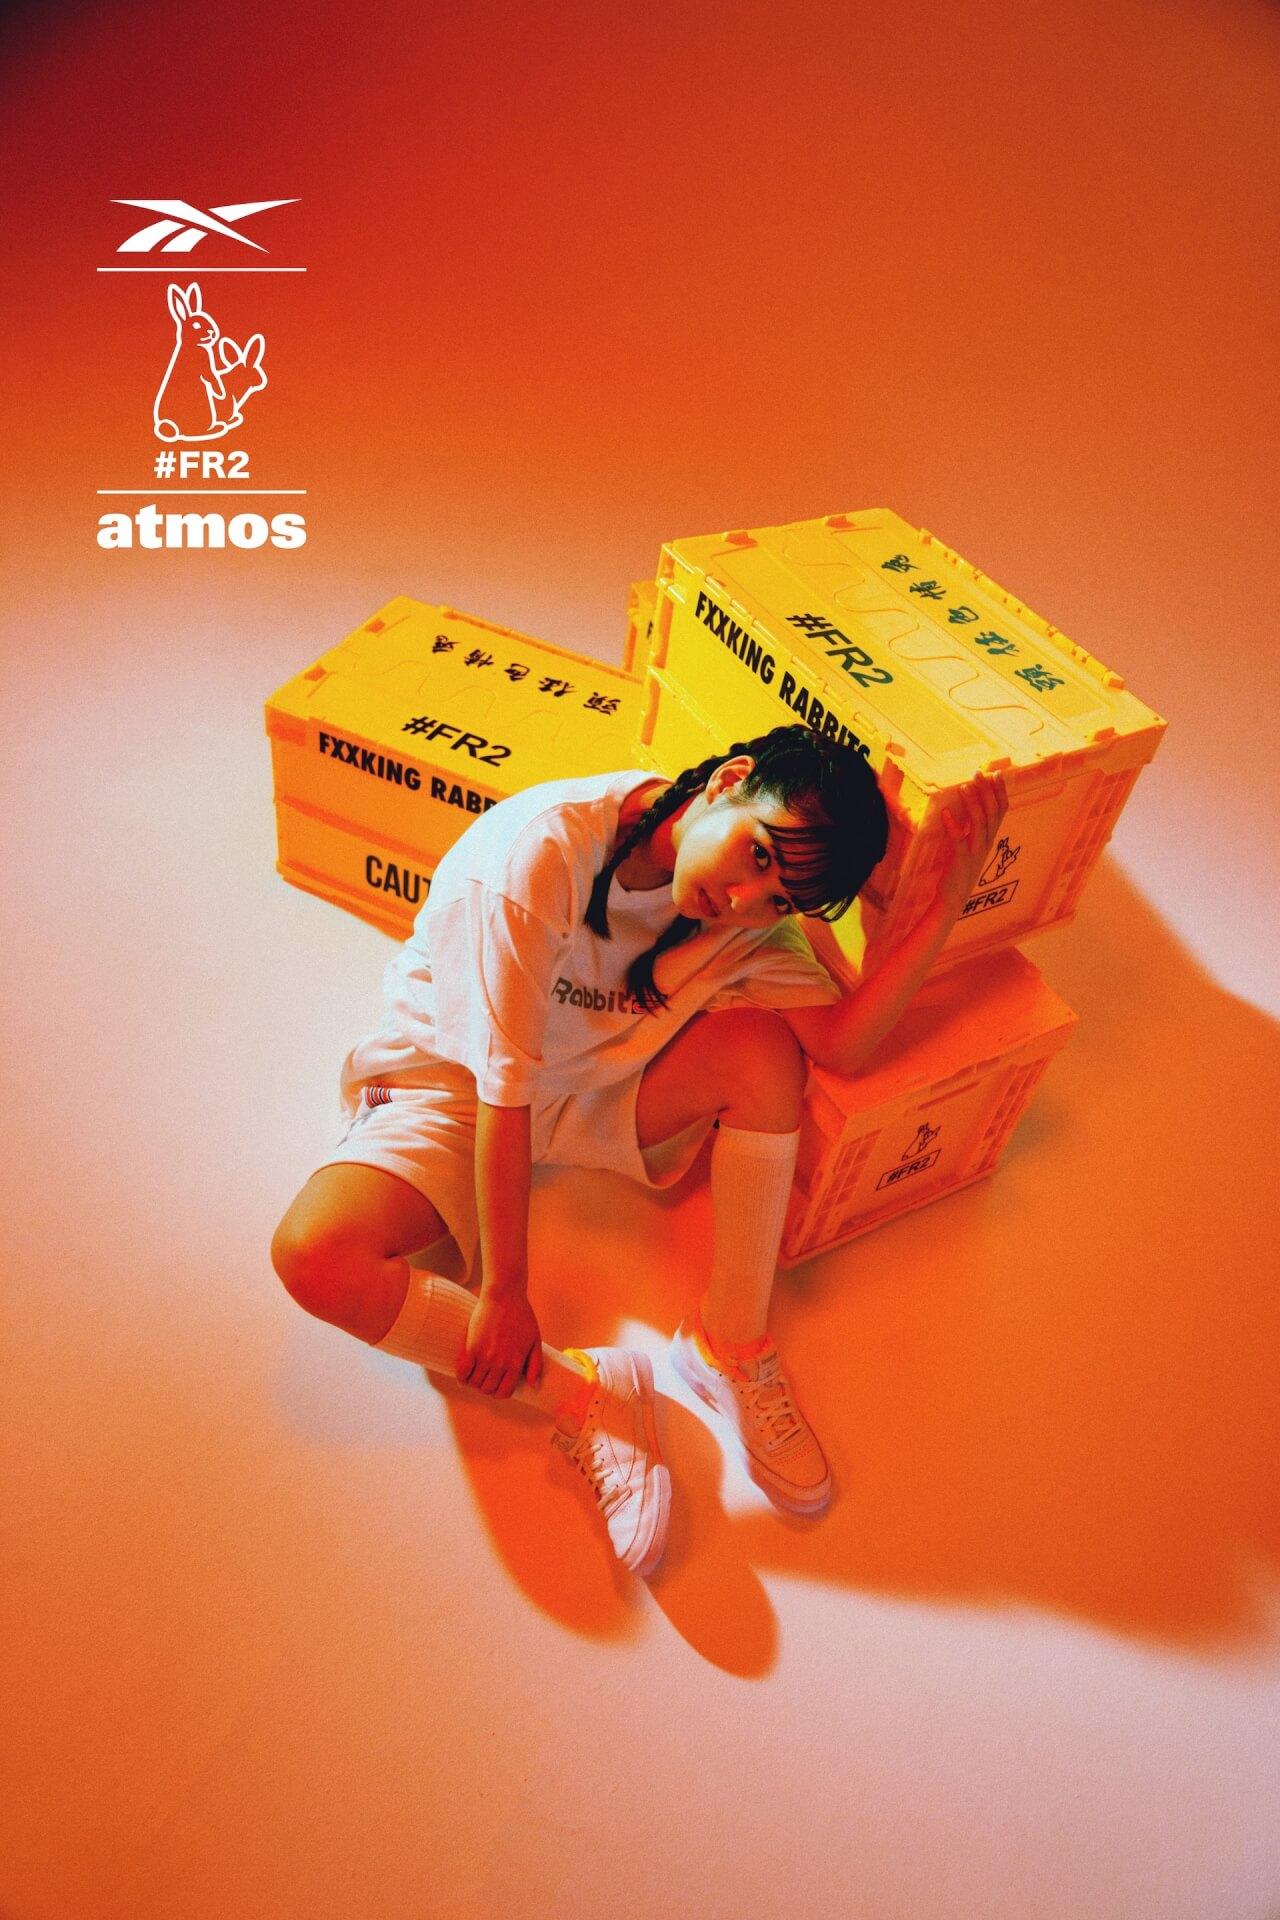 atmosと#FR2のコラボカプセルコレクションが発売!リーボック「CLUB C」ベースのスニーカーも登場 life210621_atmos_fr2_2